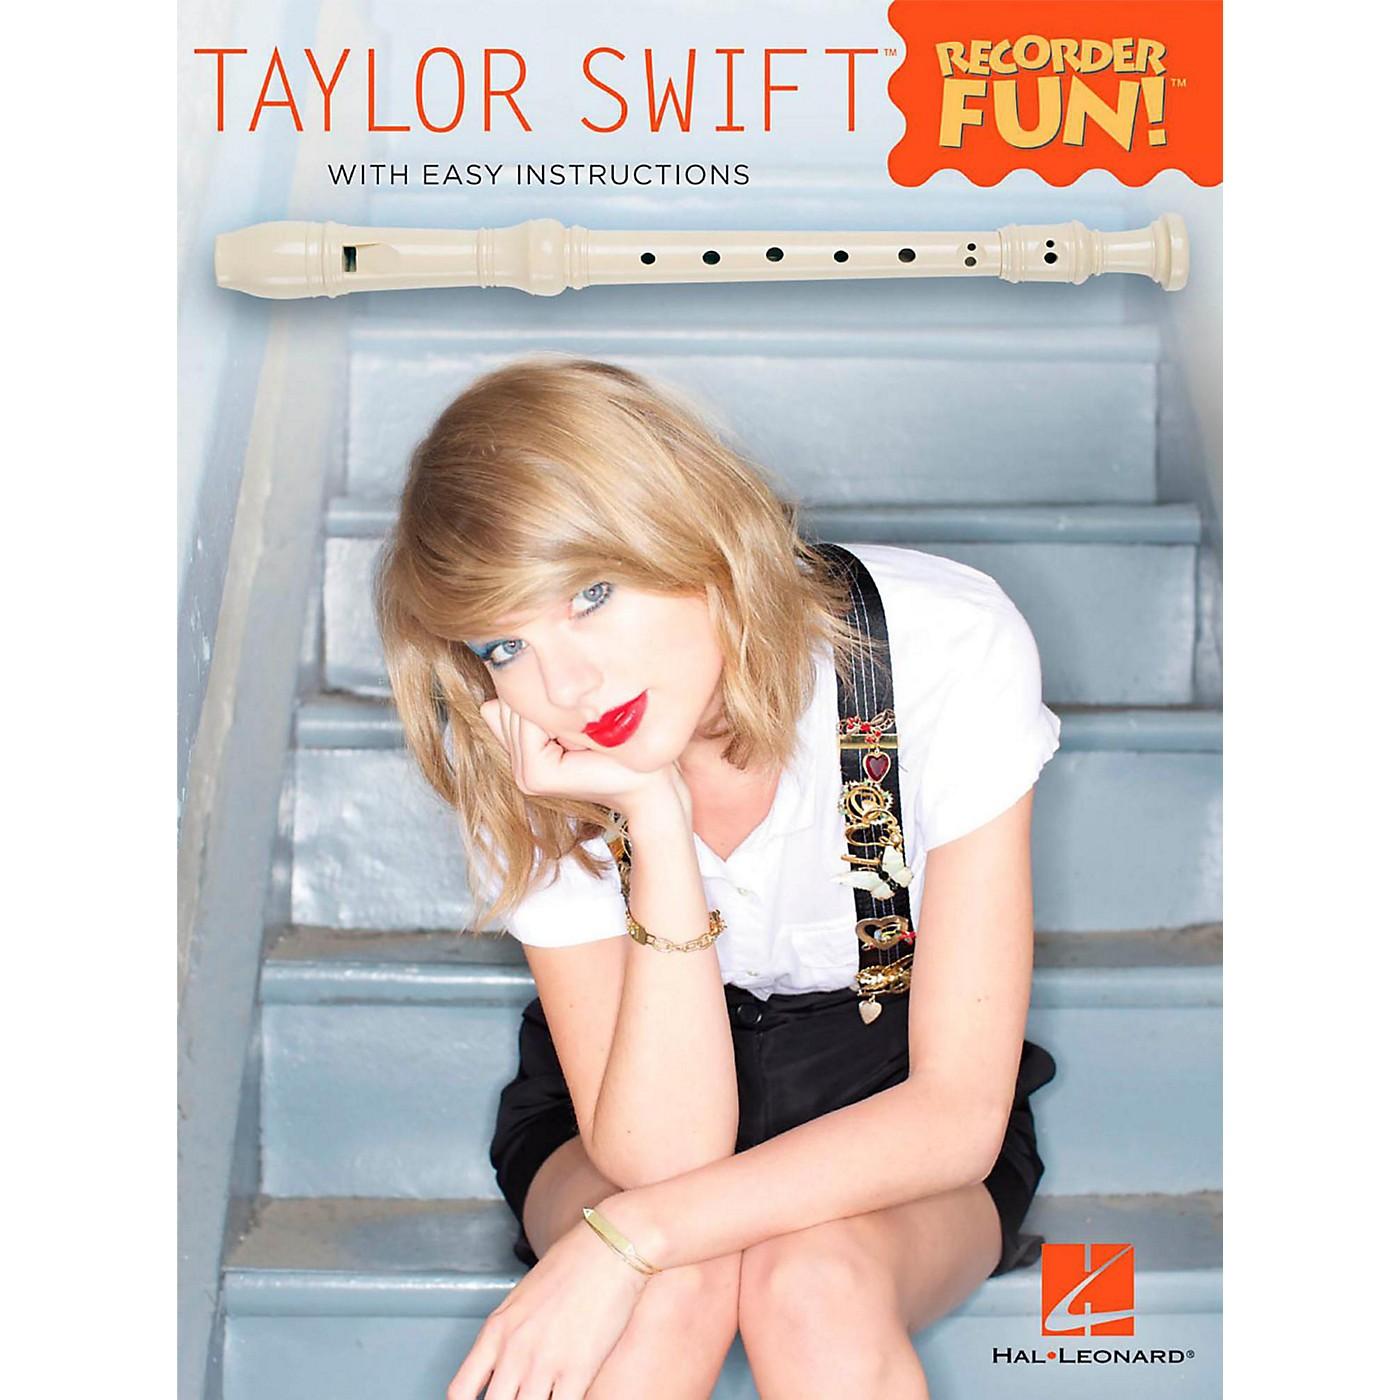 Hal Leonard Taylor Swift - Recorder Fun! Songbook thumbnail